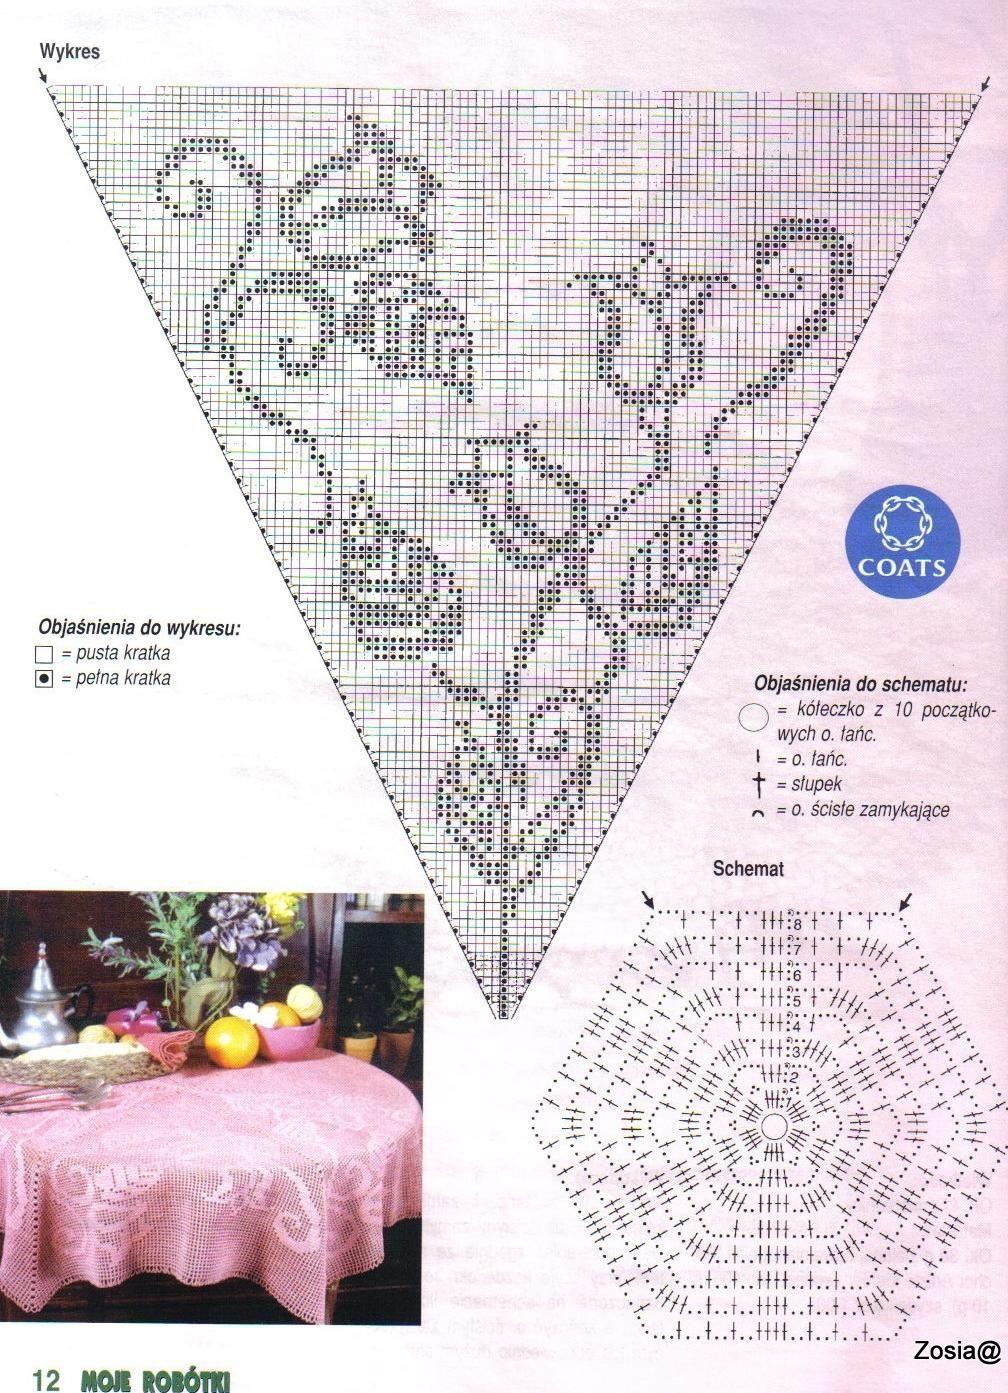 Pin de Мария Корнева en Скатерти   Pinterest   Mantel, Carpeta y ...